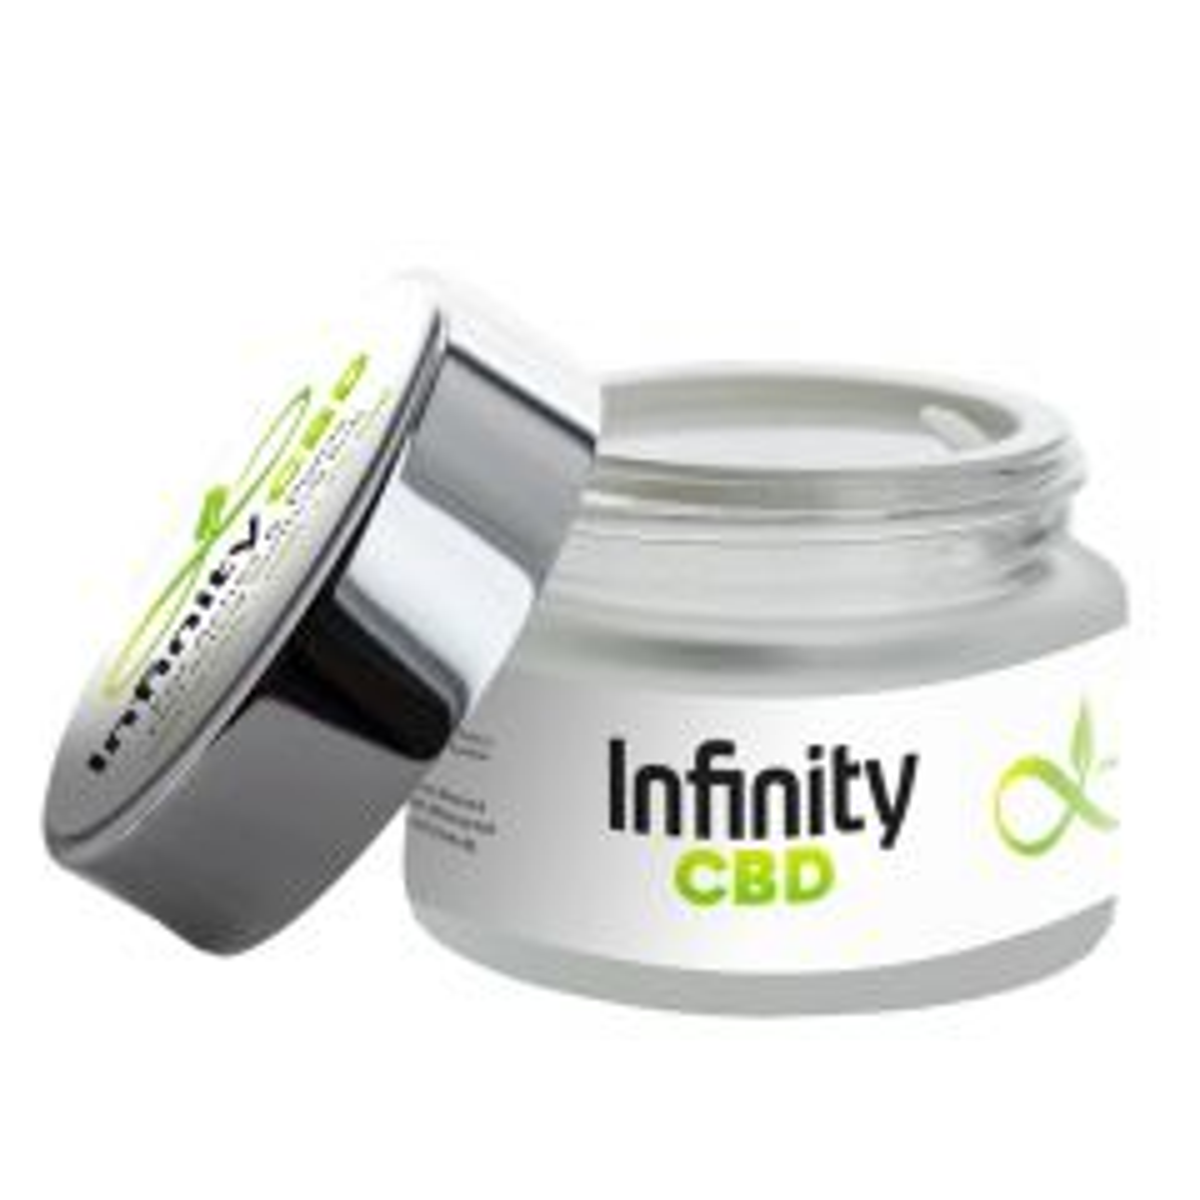 Infinity CBD - Anti Aging CBD Cream 1000mg CBD